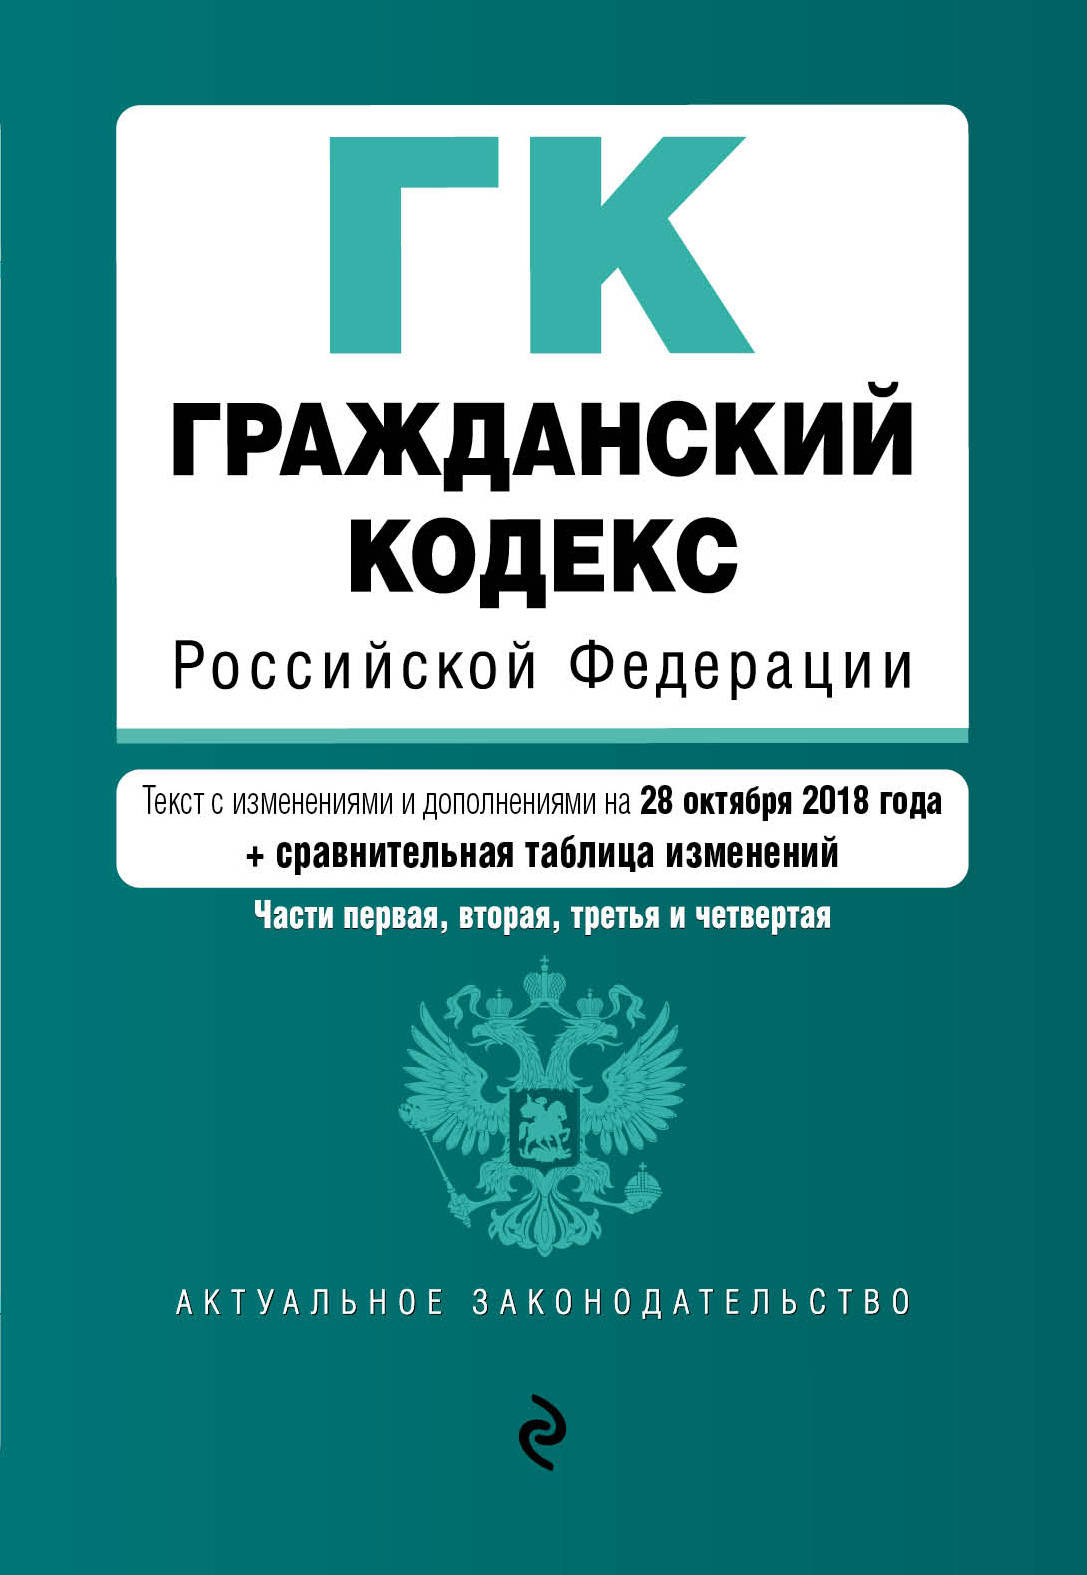 Grazhdanskij kodeks Rossijskoj Federatsii. Chasti 1, 2, 3 i 4. Tekst s izm. i dop. na 28 oktjabrja 2018 g. (+ sravnitelnaja tablitsa izmenenij)